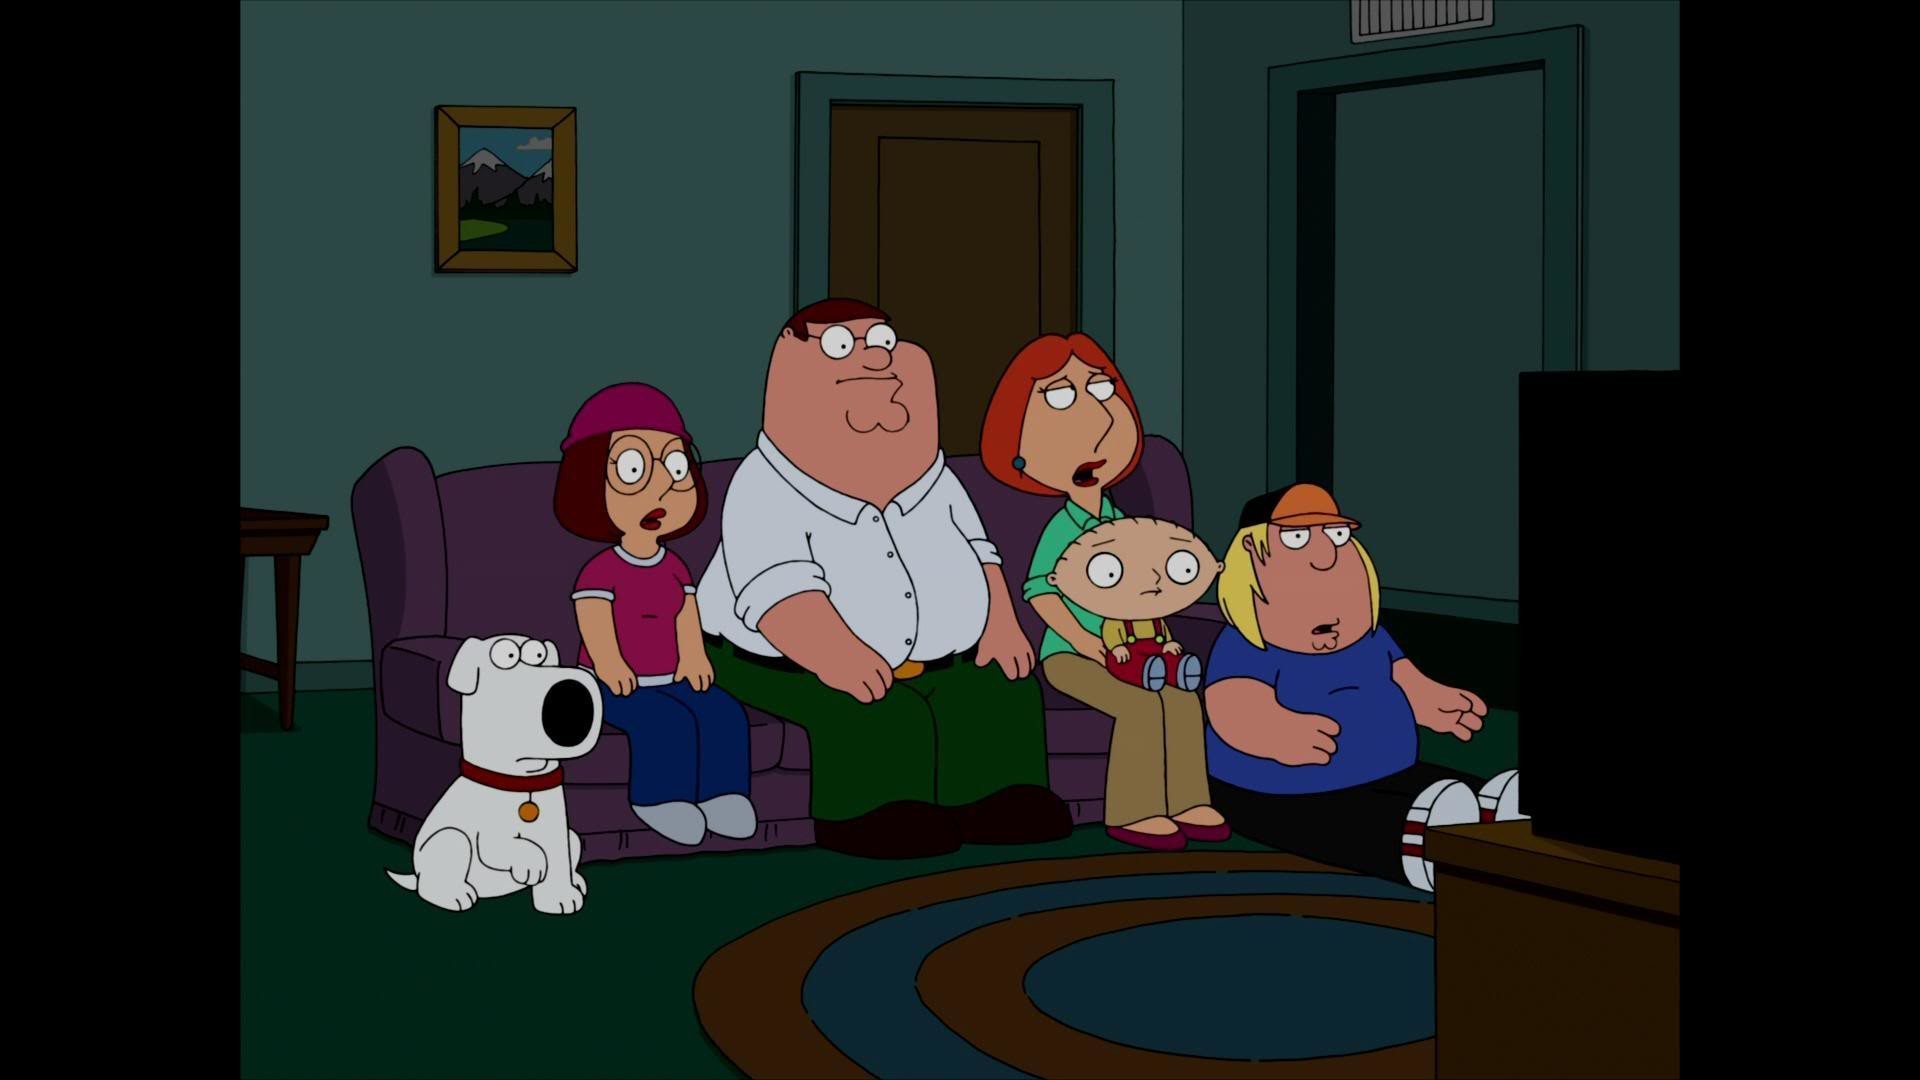 quagmire family guy wiki